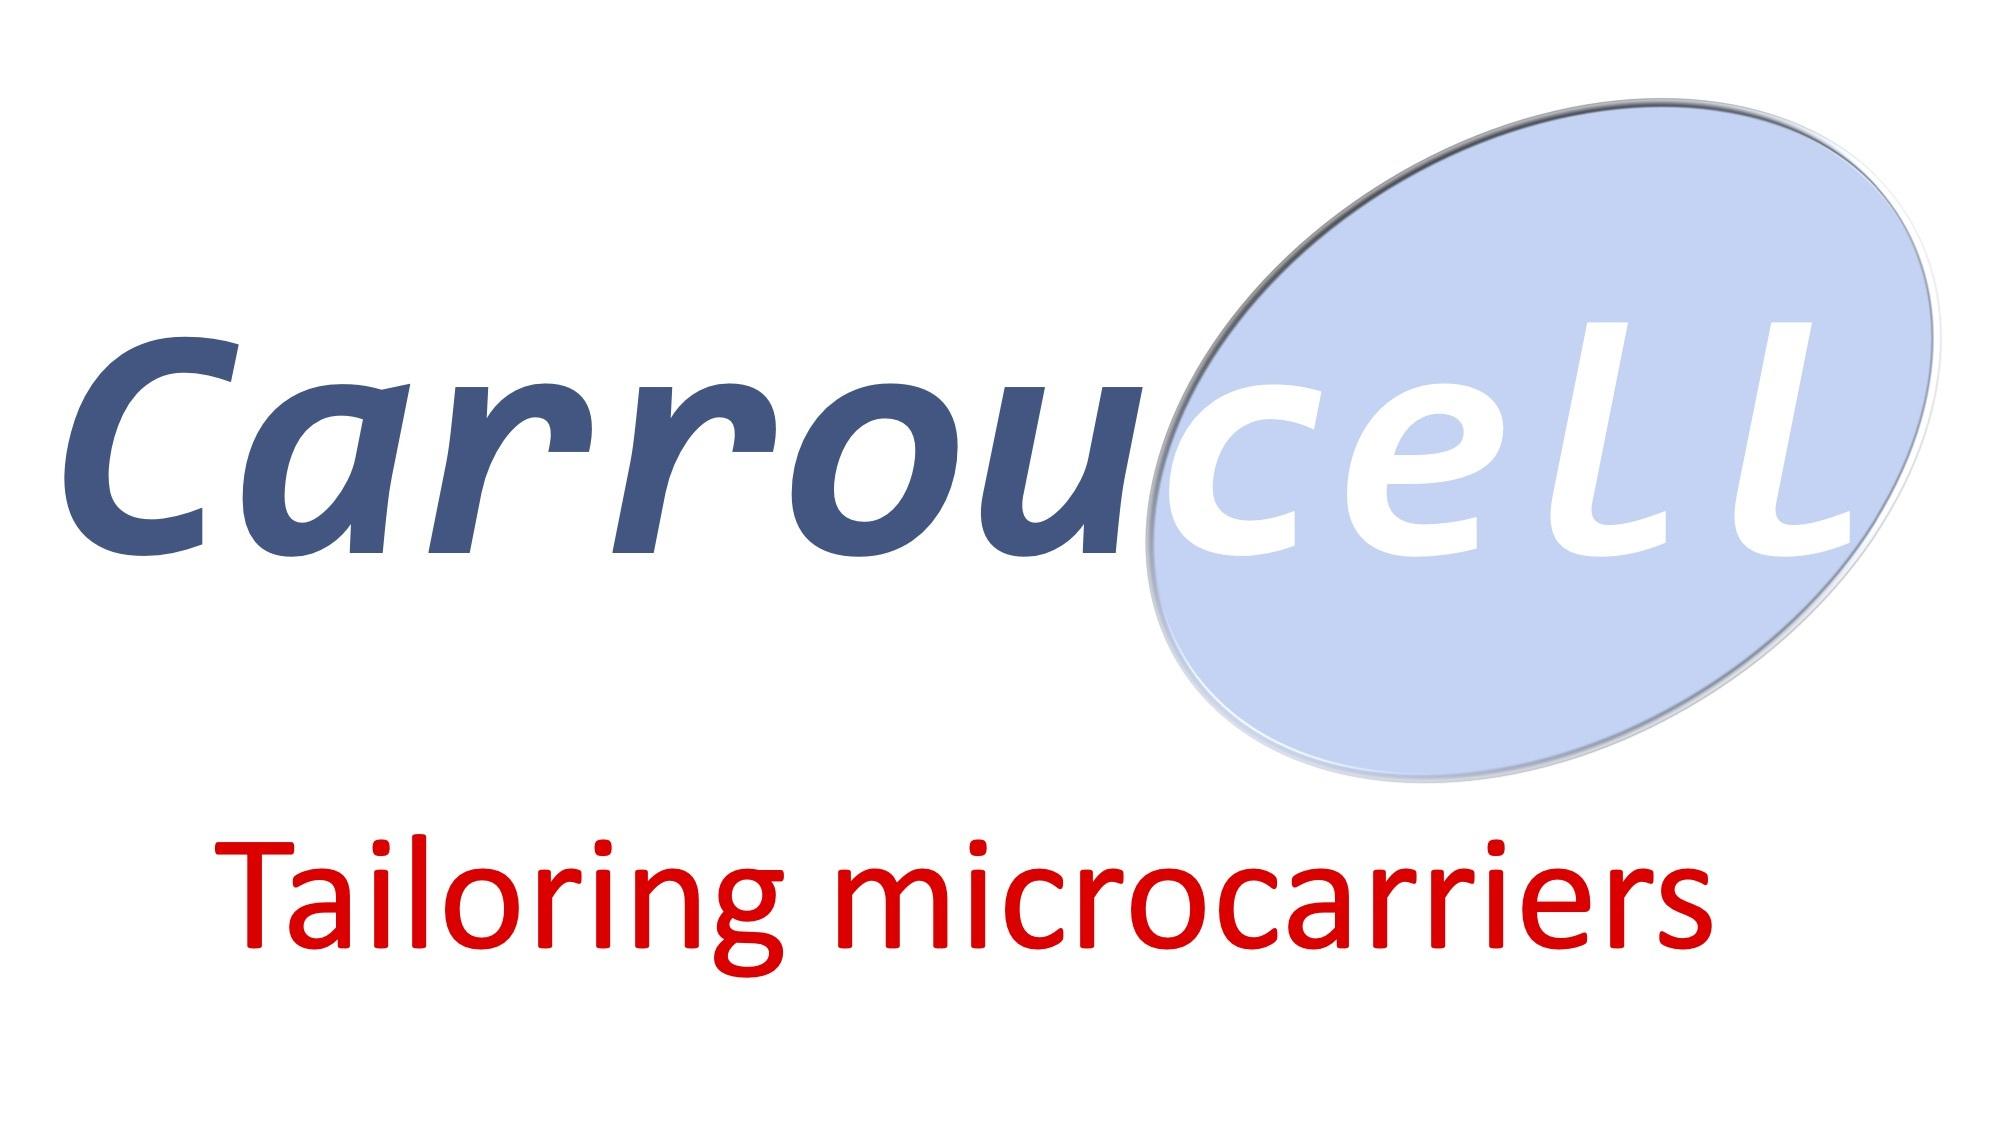 Carroucell logo vectoriel O Kjpg